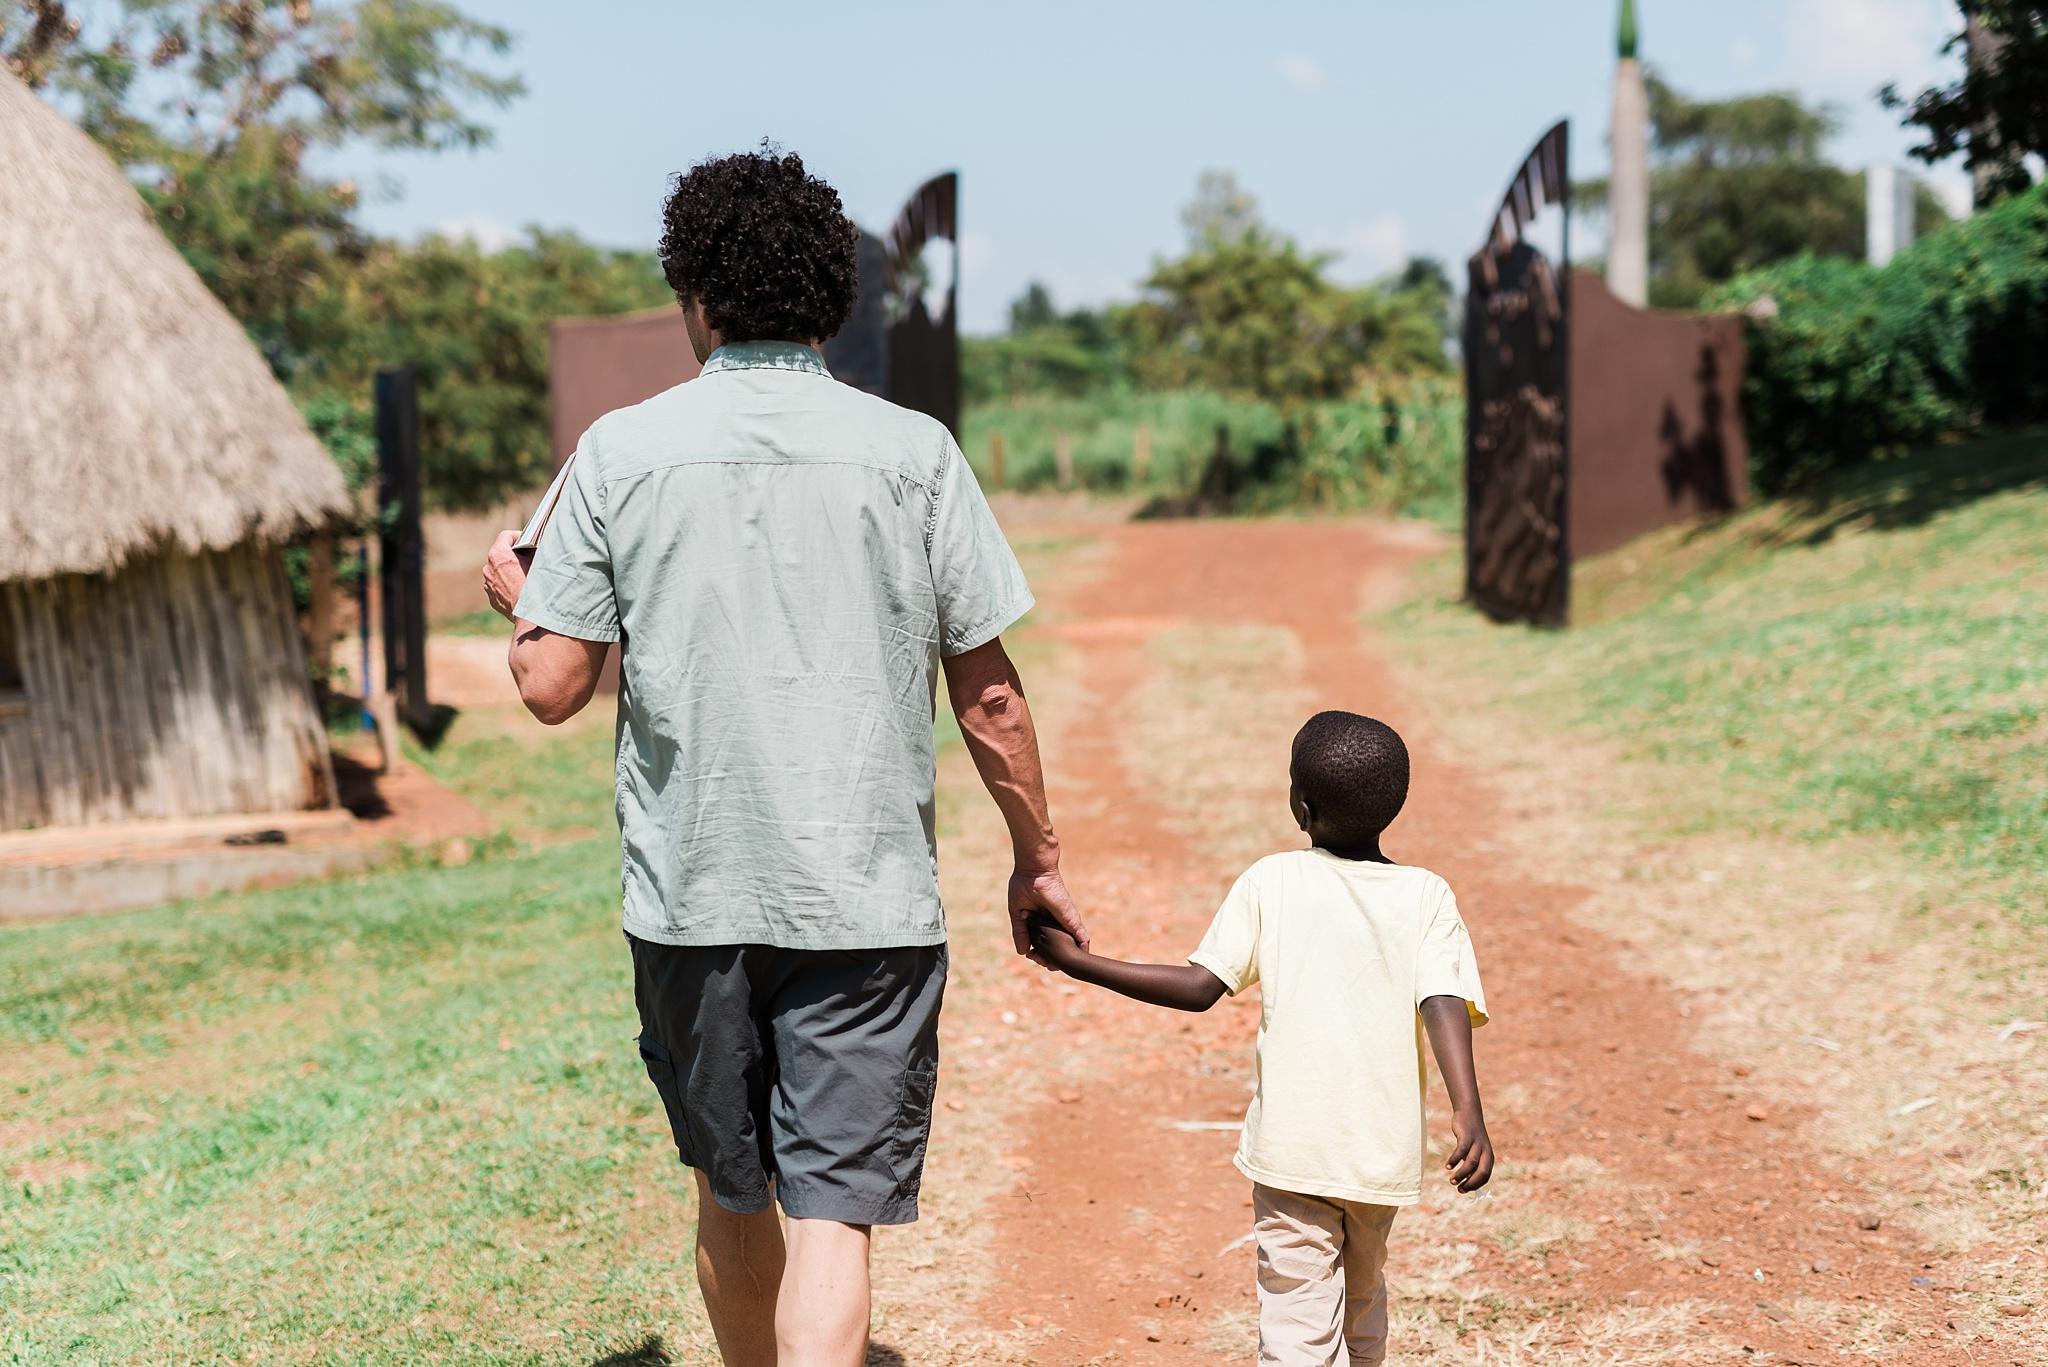 destination-photographer-uganda-graceforeducation-433.jpg